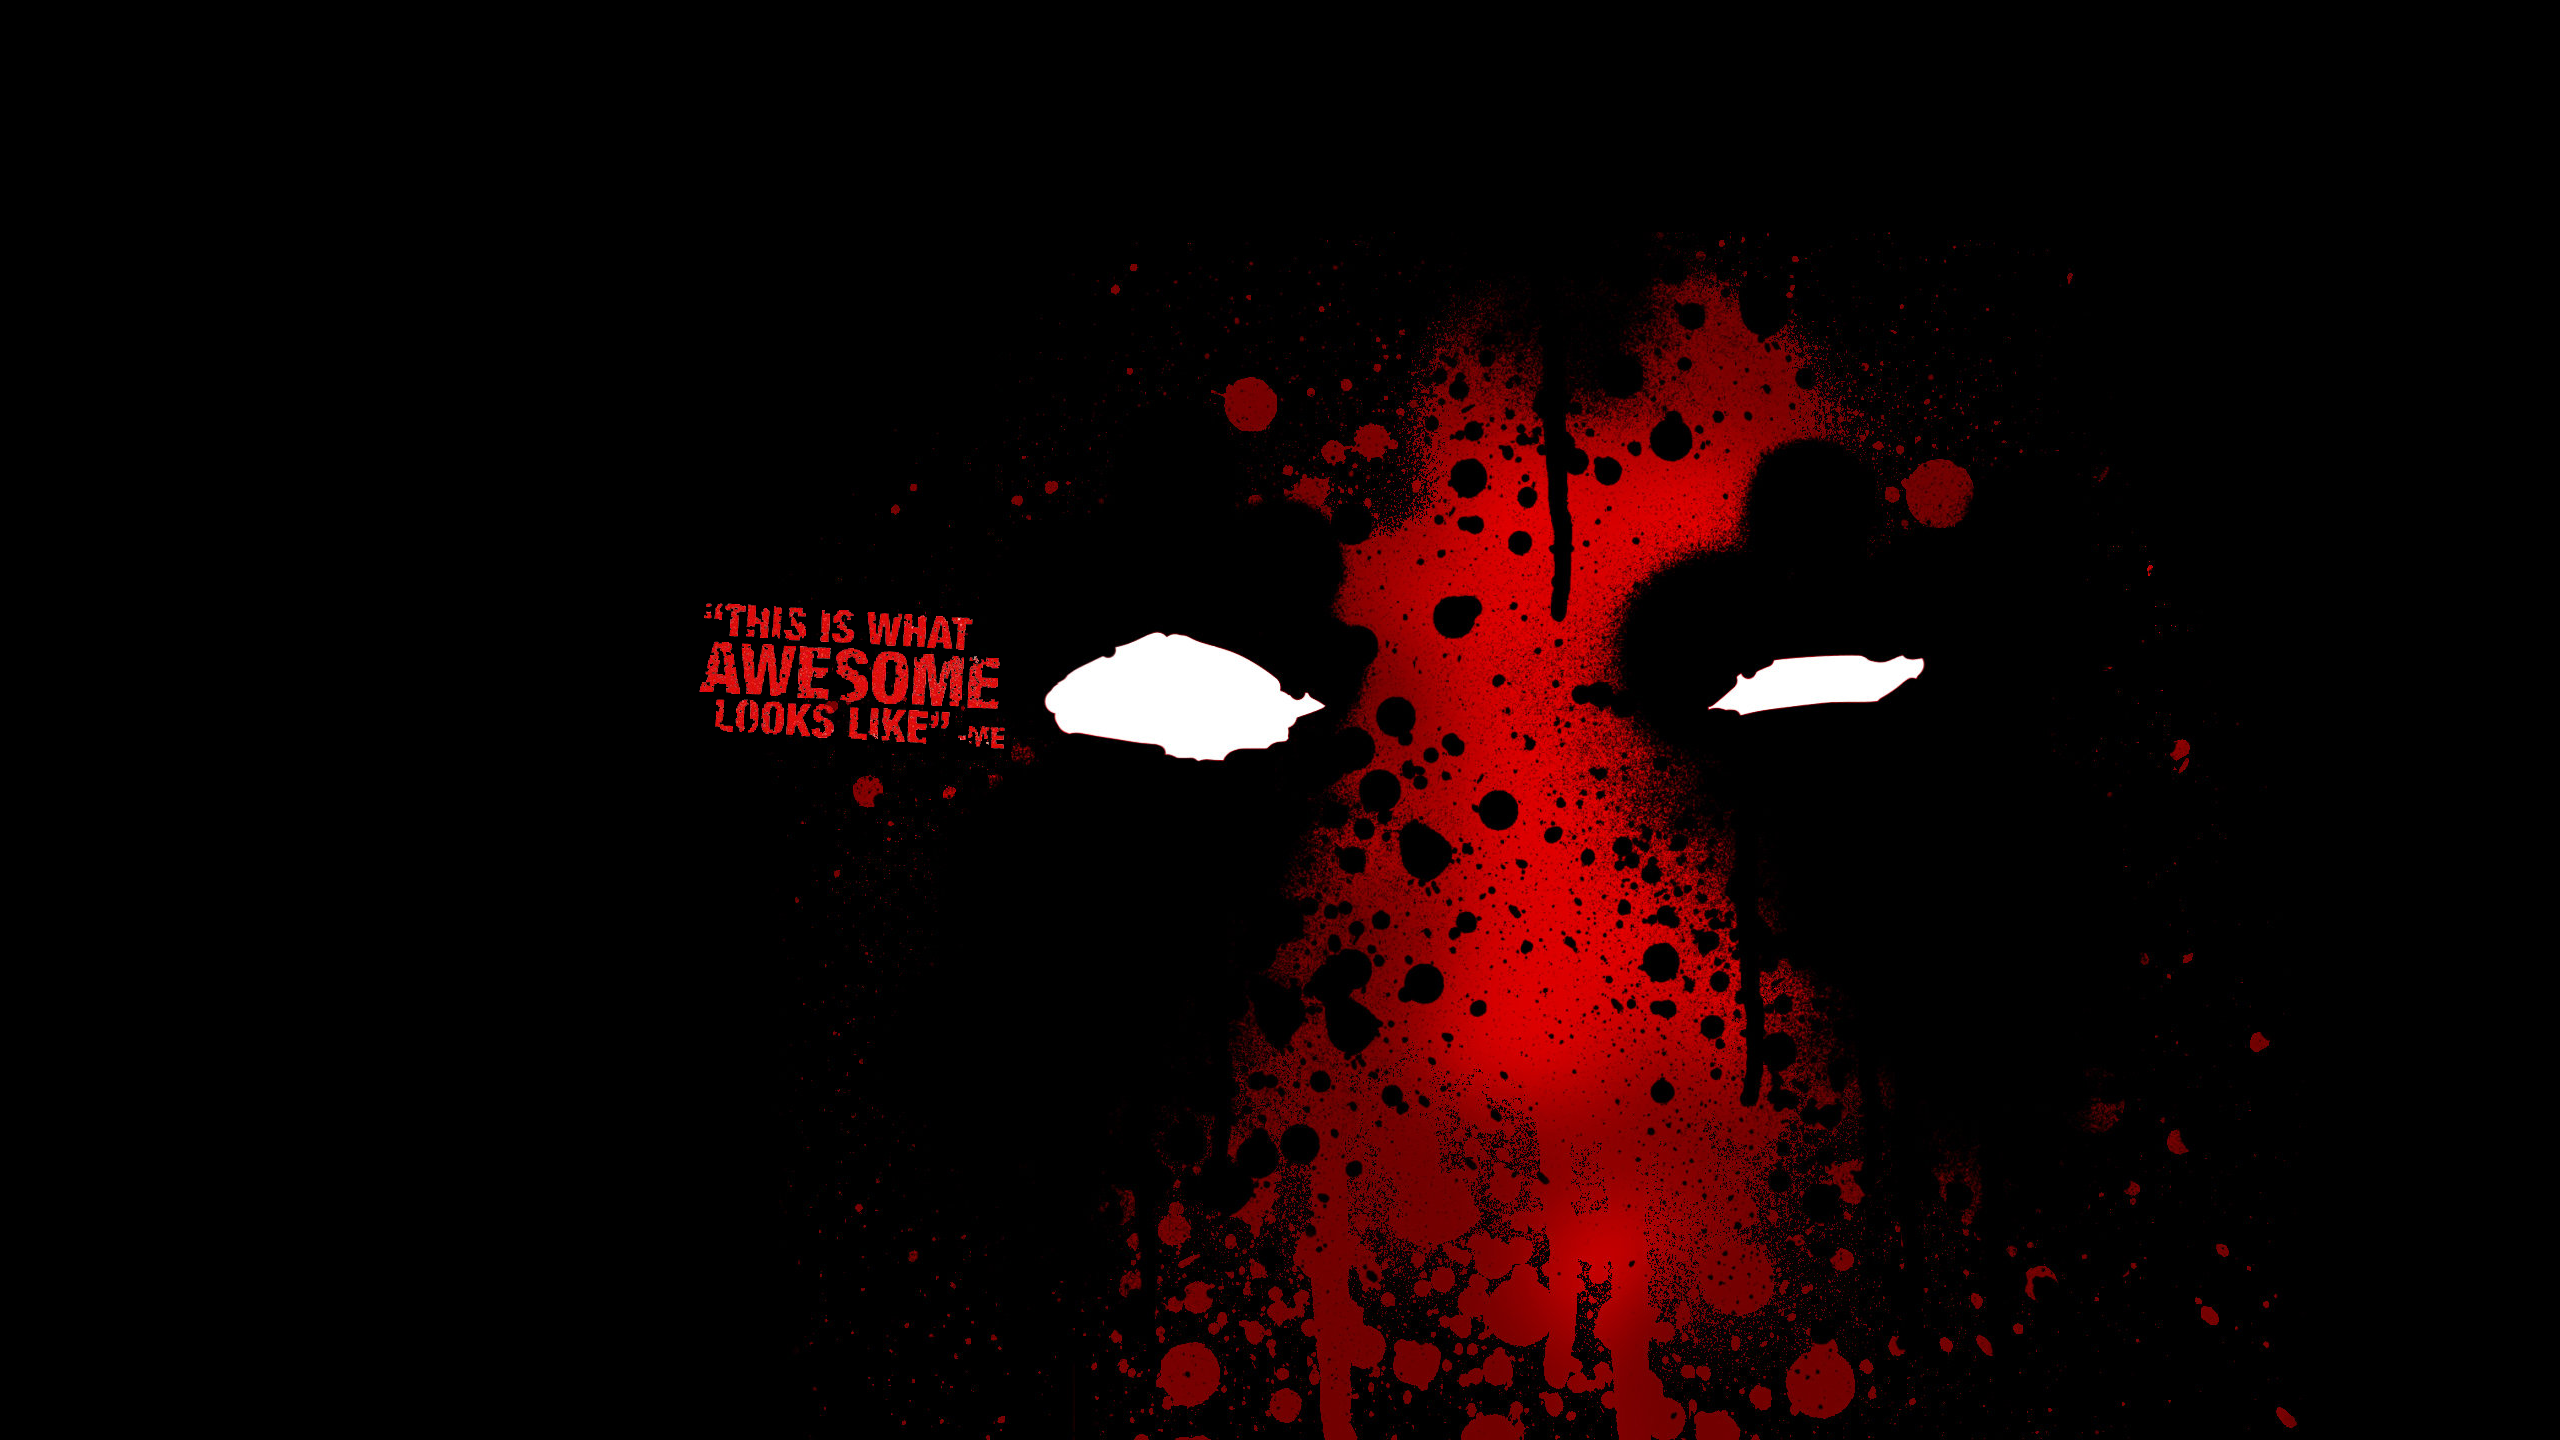 Deadpool Channel Art For Youtube By Ghostgamer37 Fan Cartoons 2560x1440